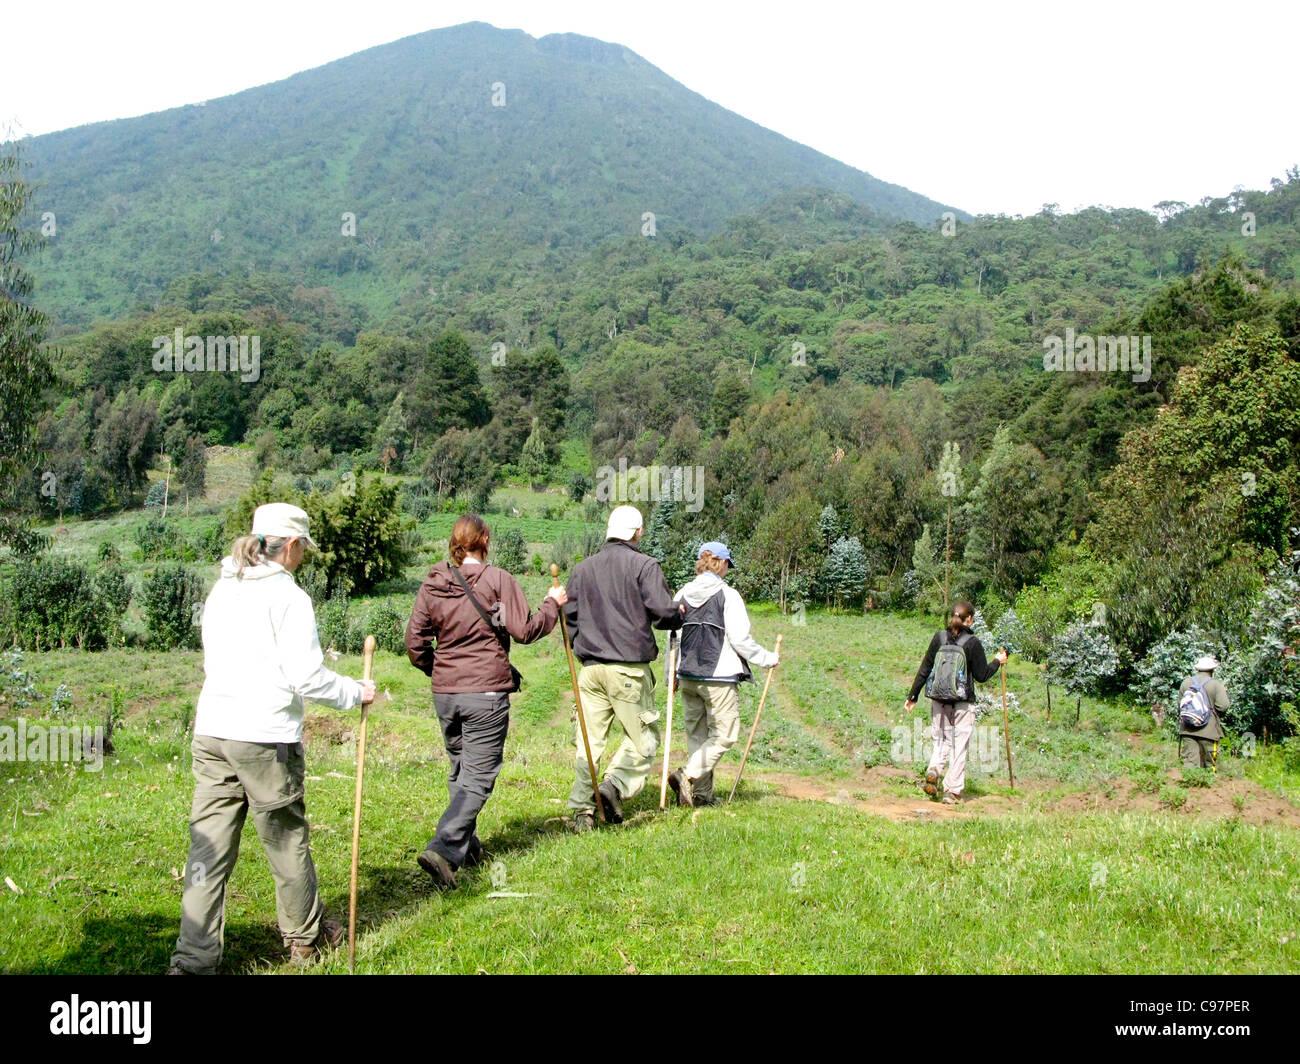 Virunga Mountains, Rwanda.  Tourists trekking into Volcanoes National Park to view the mountain gorillas. - Stock Image